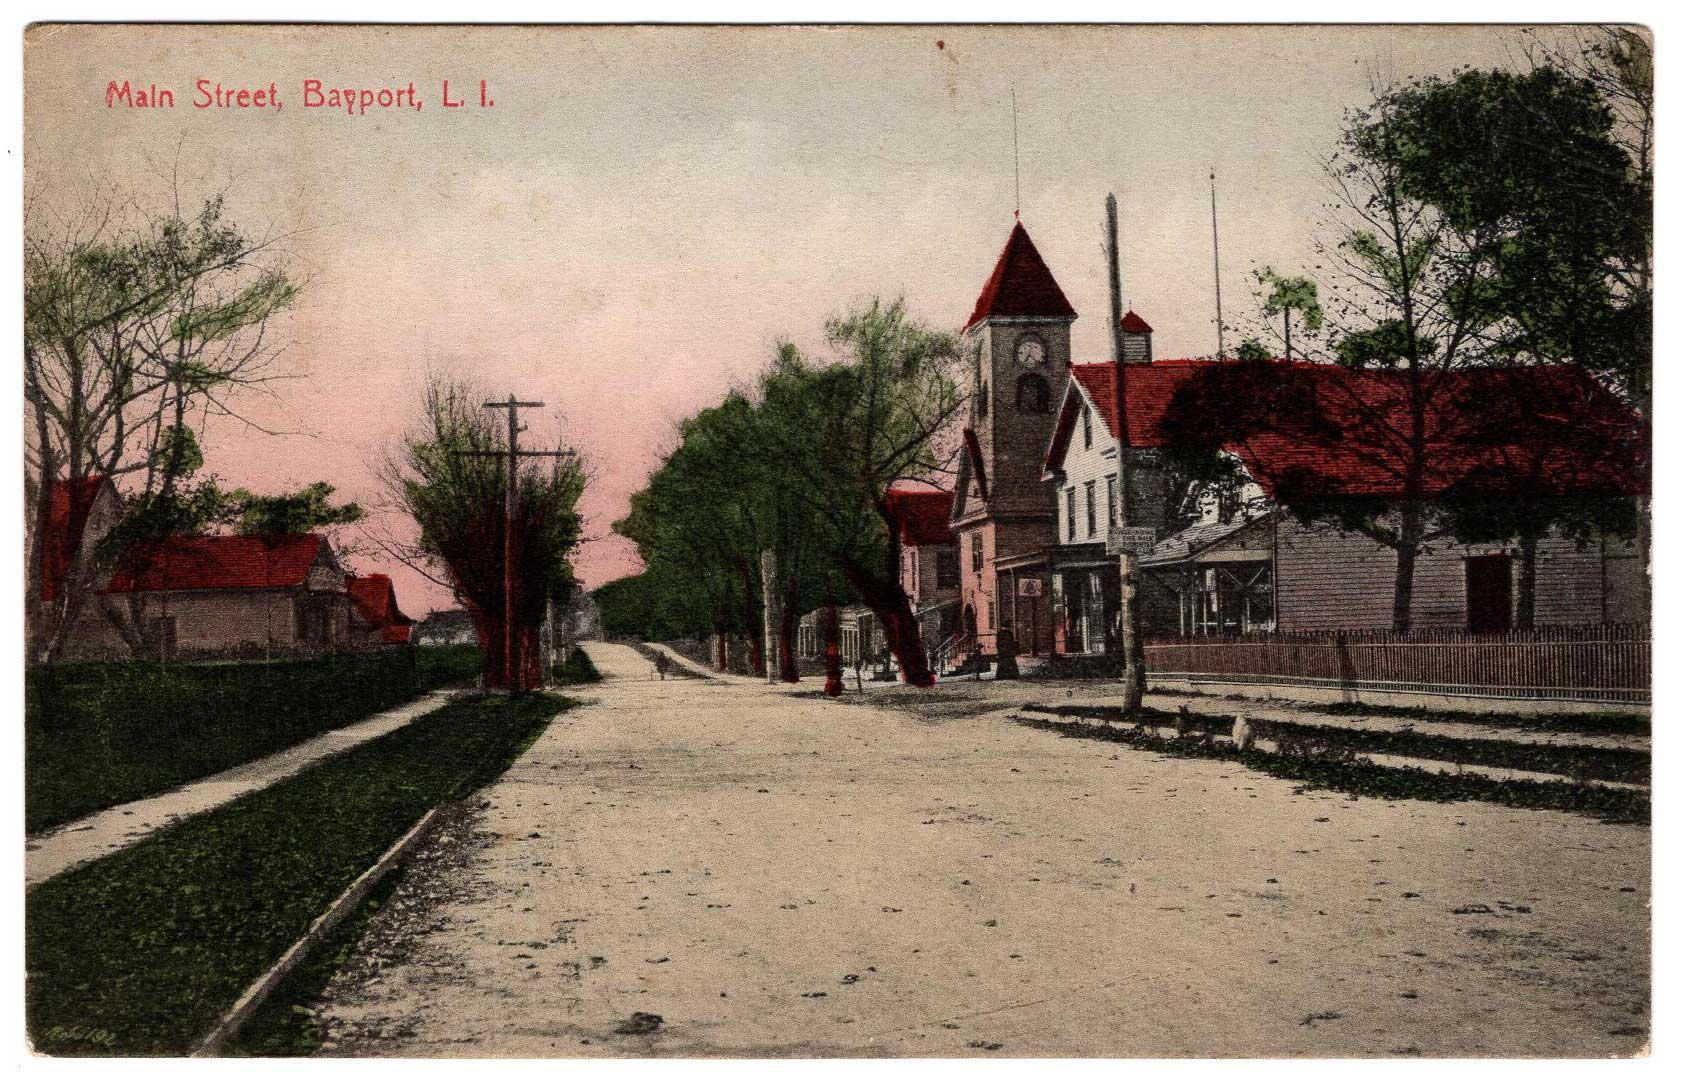 Main Street Bayport